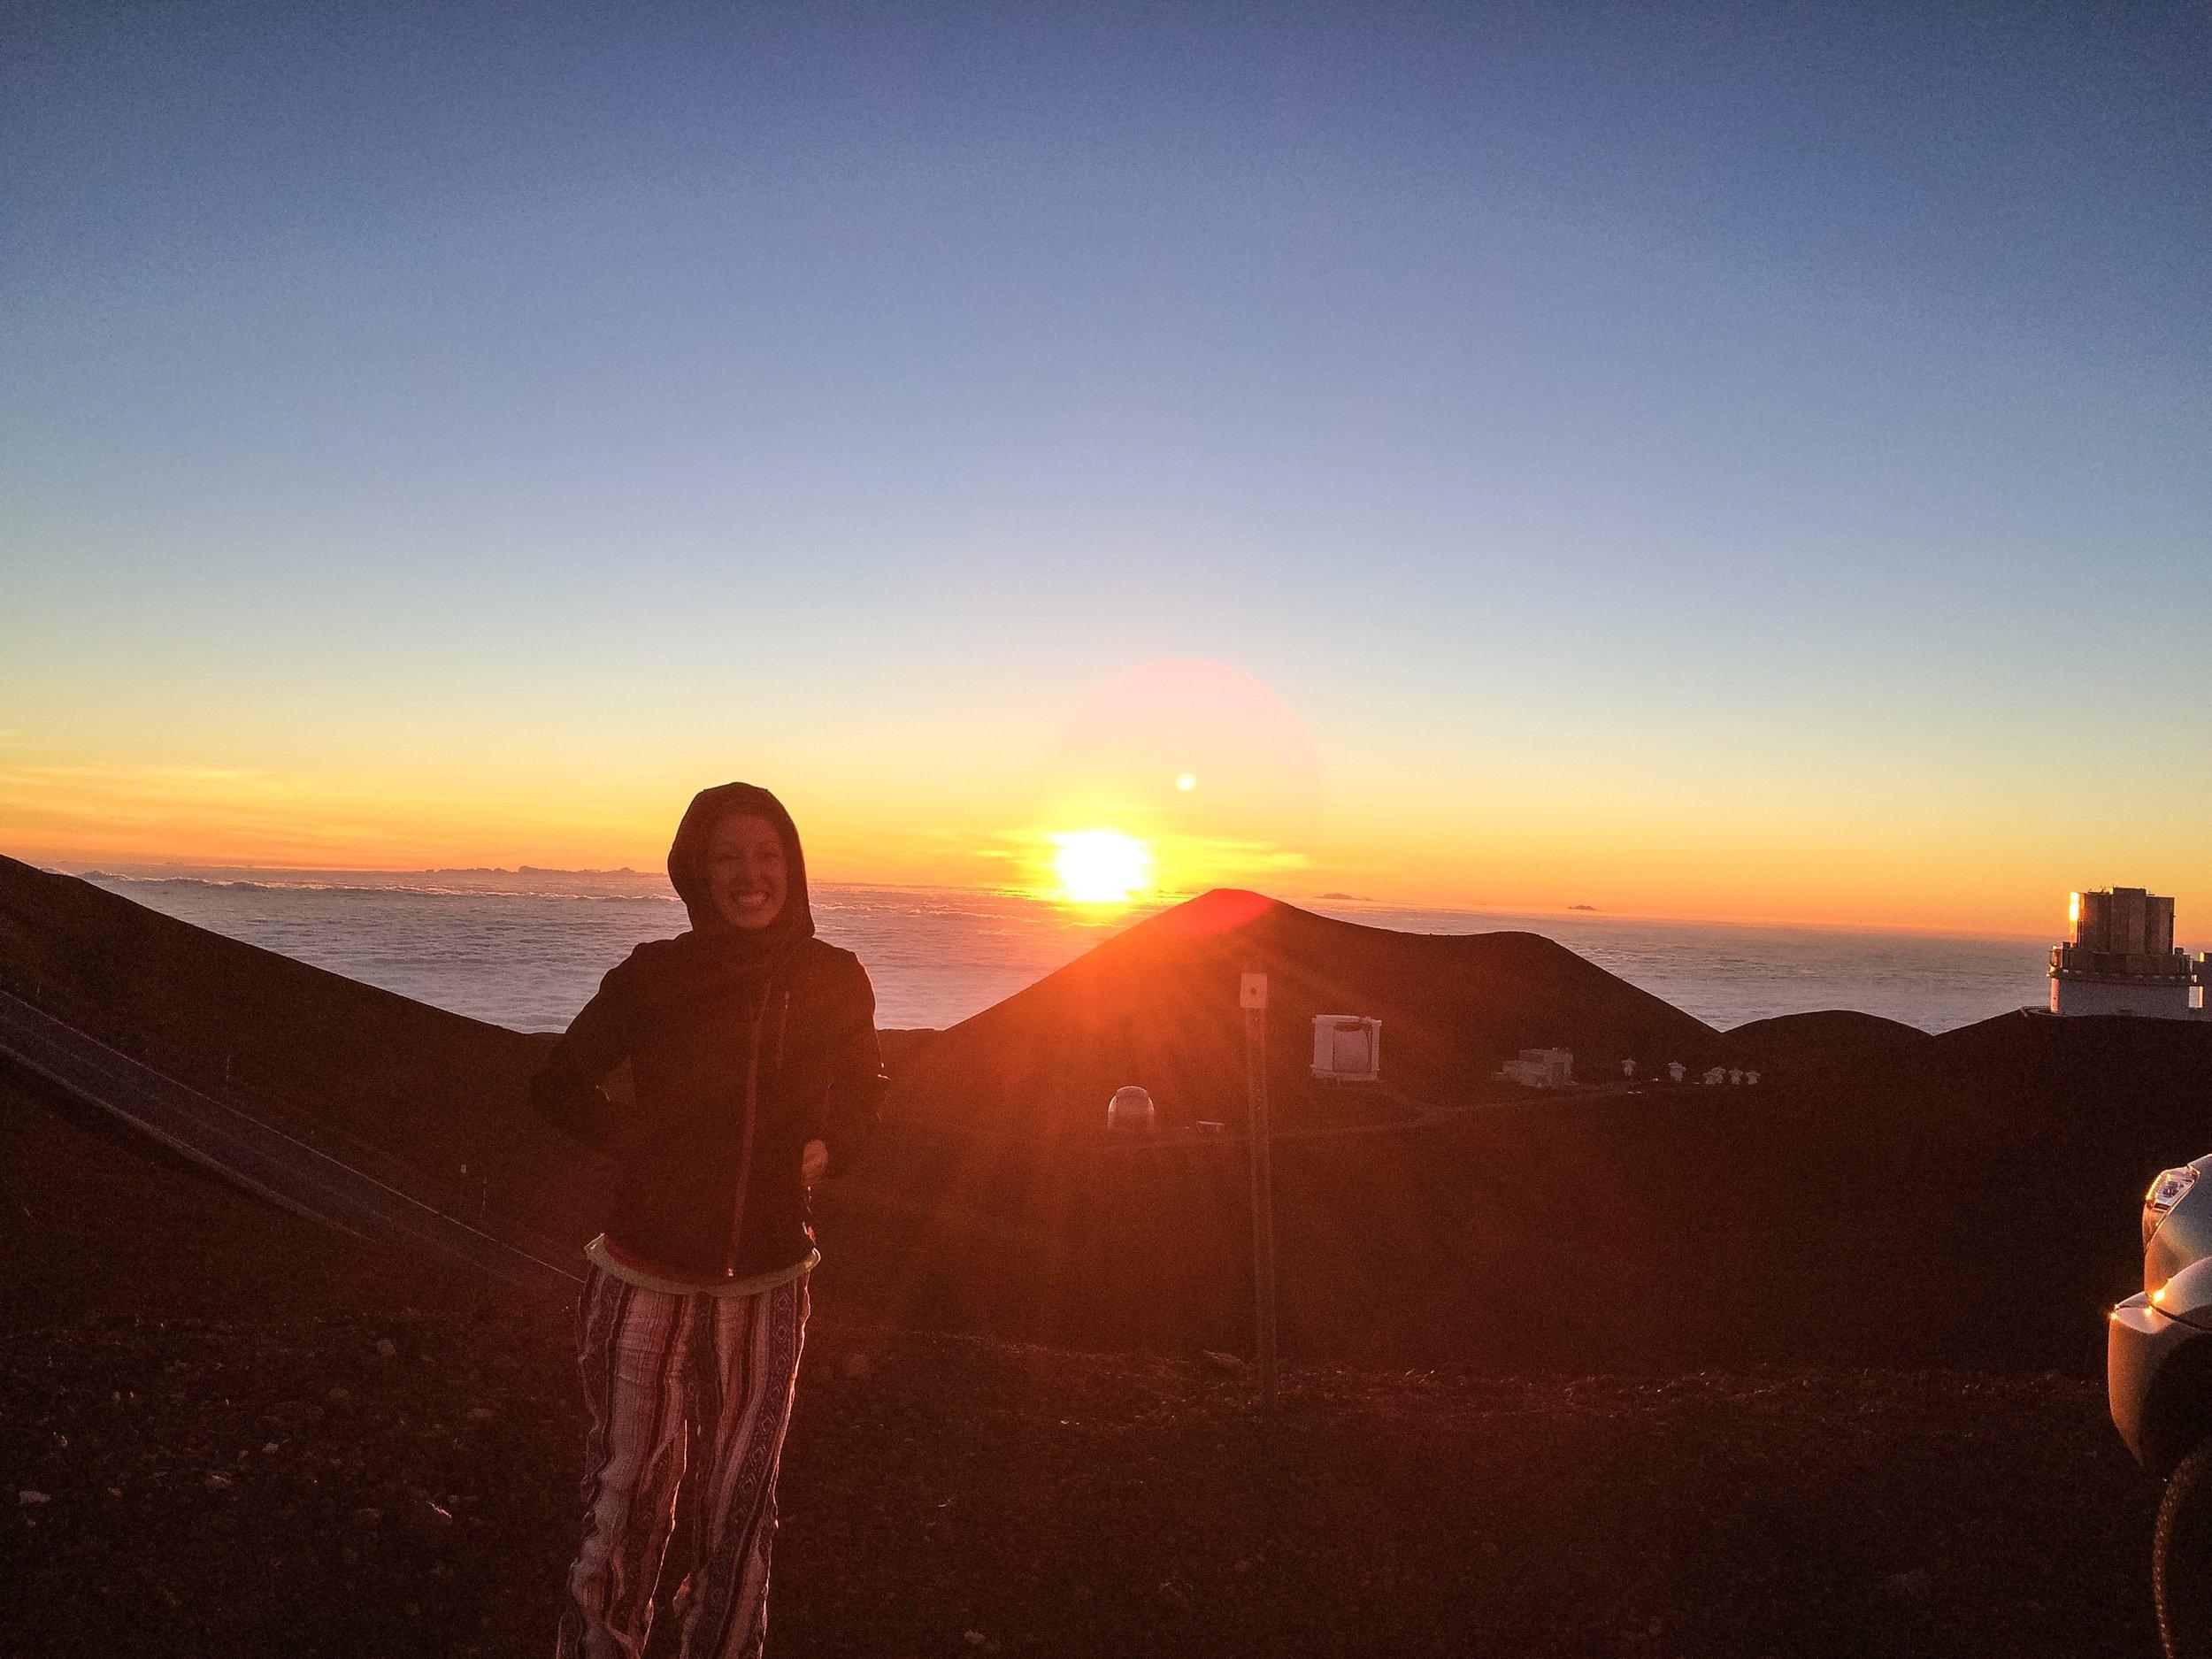 Sunset on Mauna Kea